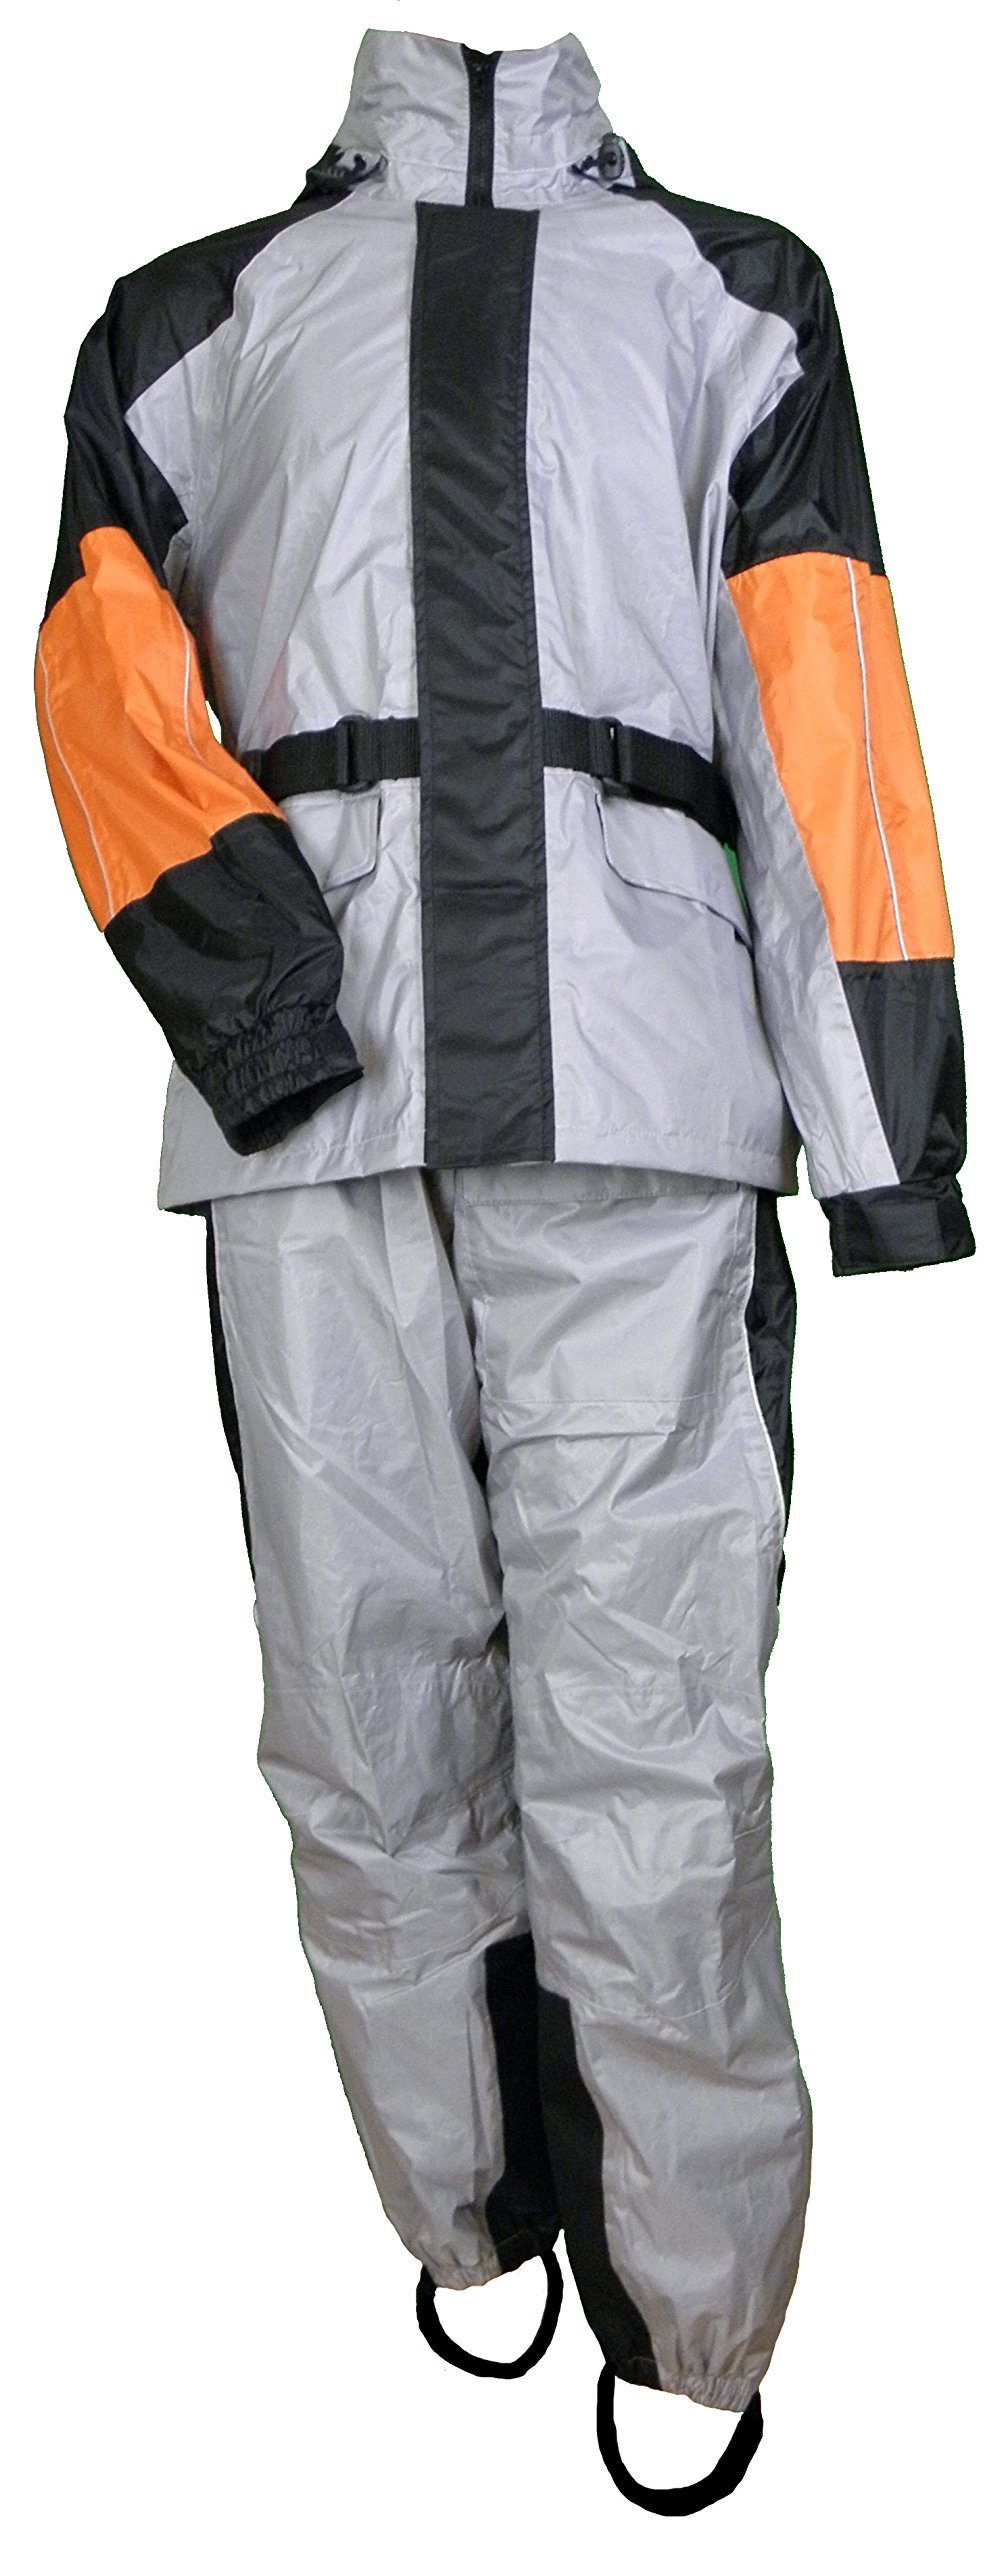 Premium Rainsuit Black/Gray & Orange by Vance Leather